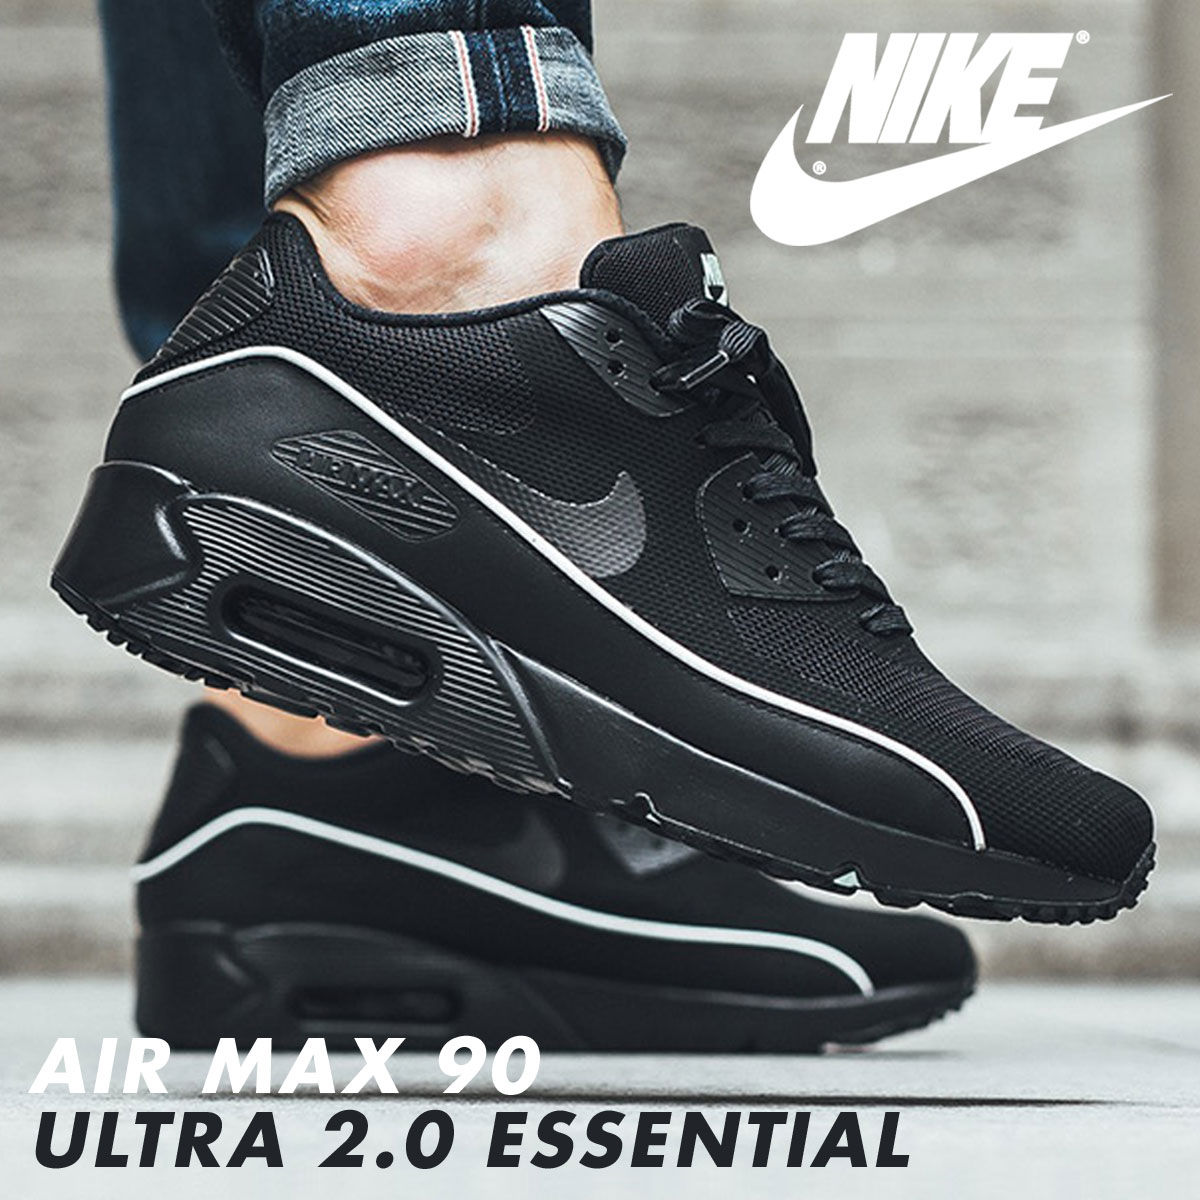 bf9fc44caebc4 ... NIKE Kie Ney AMAX 90 essential ultra sneakers AIR MAX 90 ULTRA 2.0  ESSENTIAL 875,695- ...